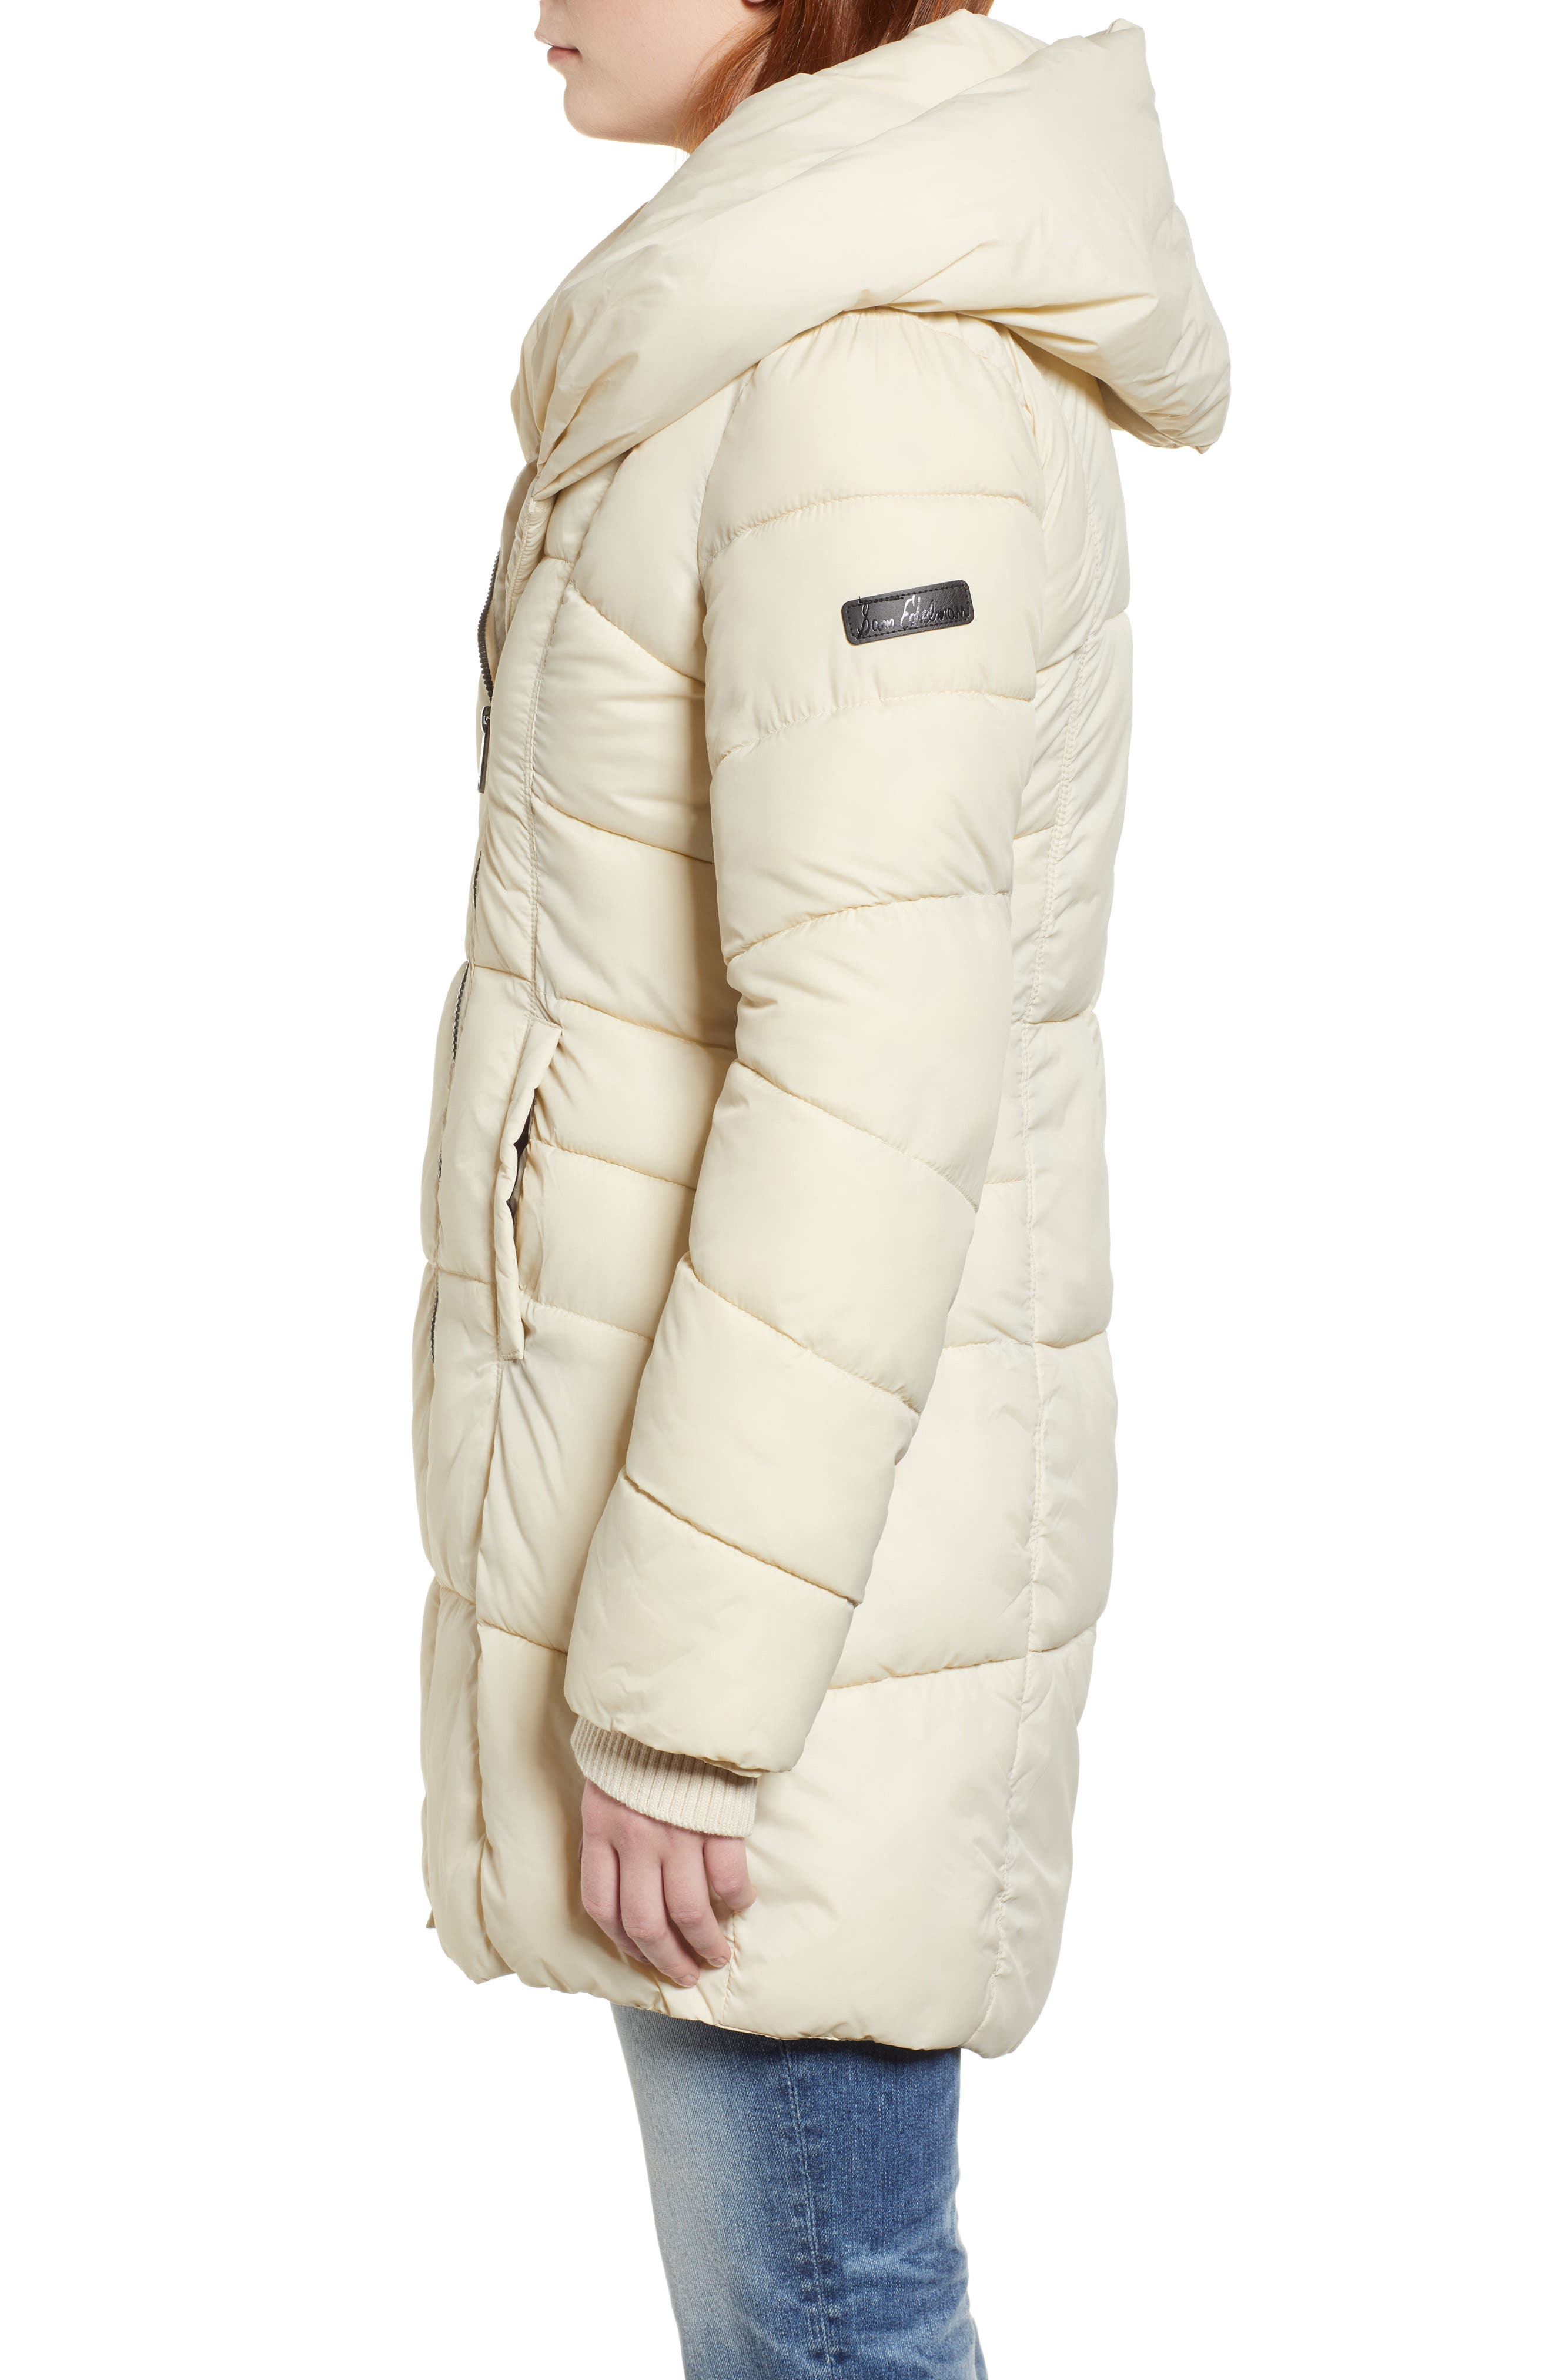 Pillow Collar Puffer Coat,                             Alternate thumbnail 3, color,                             IVORY